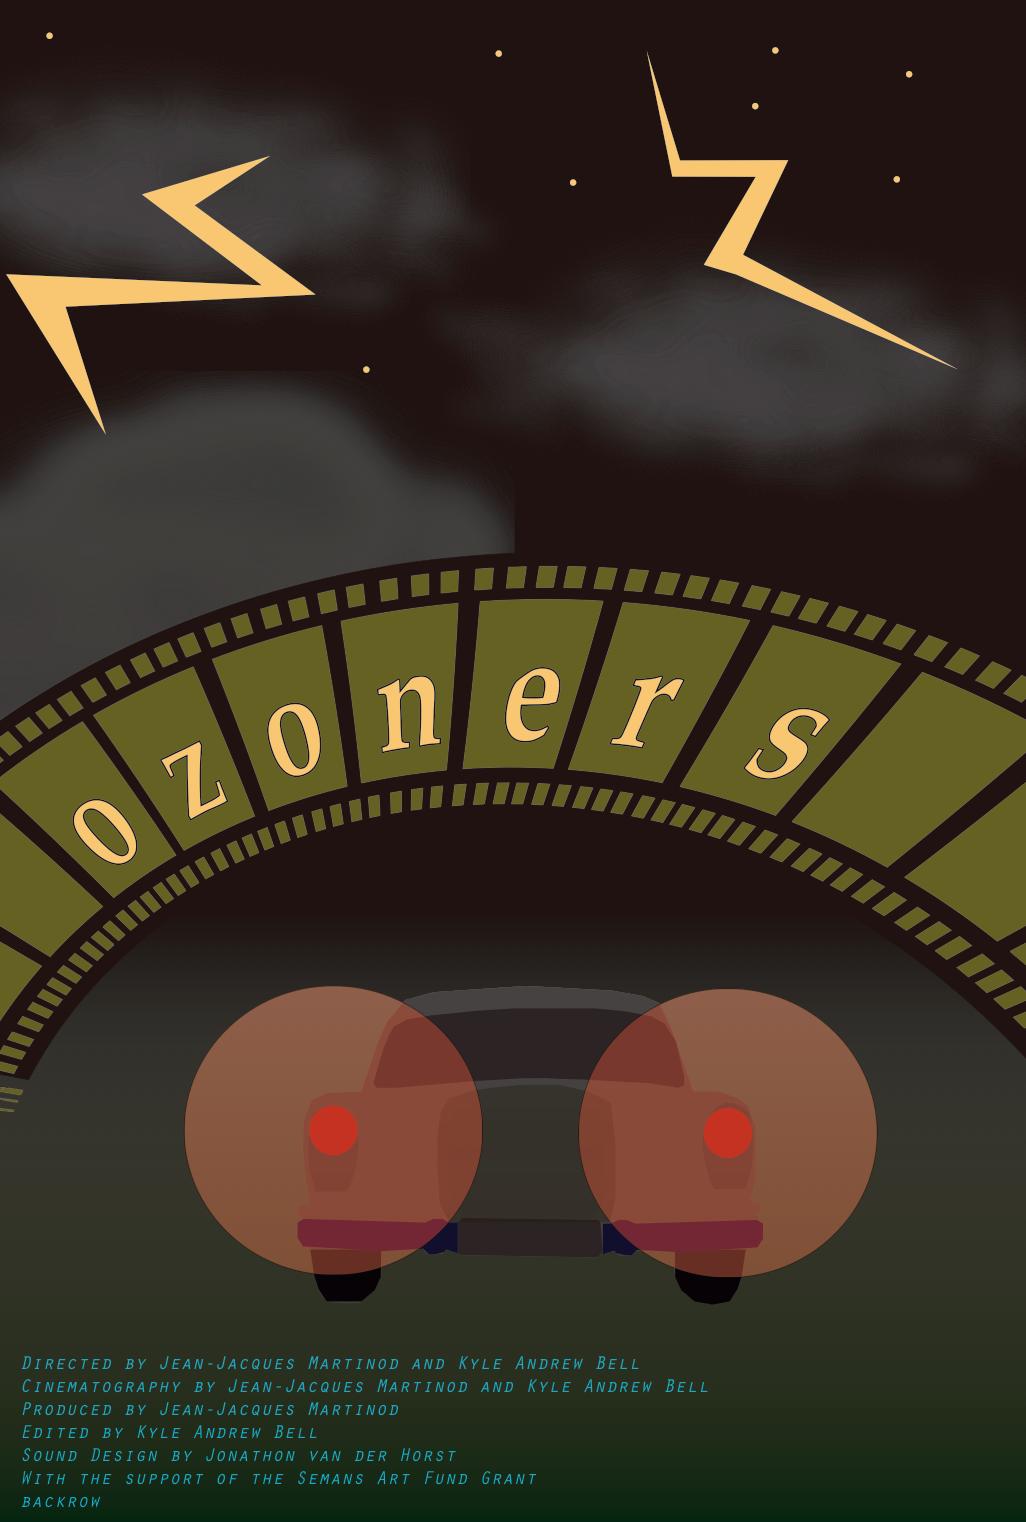 Ozoners Poster Design